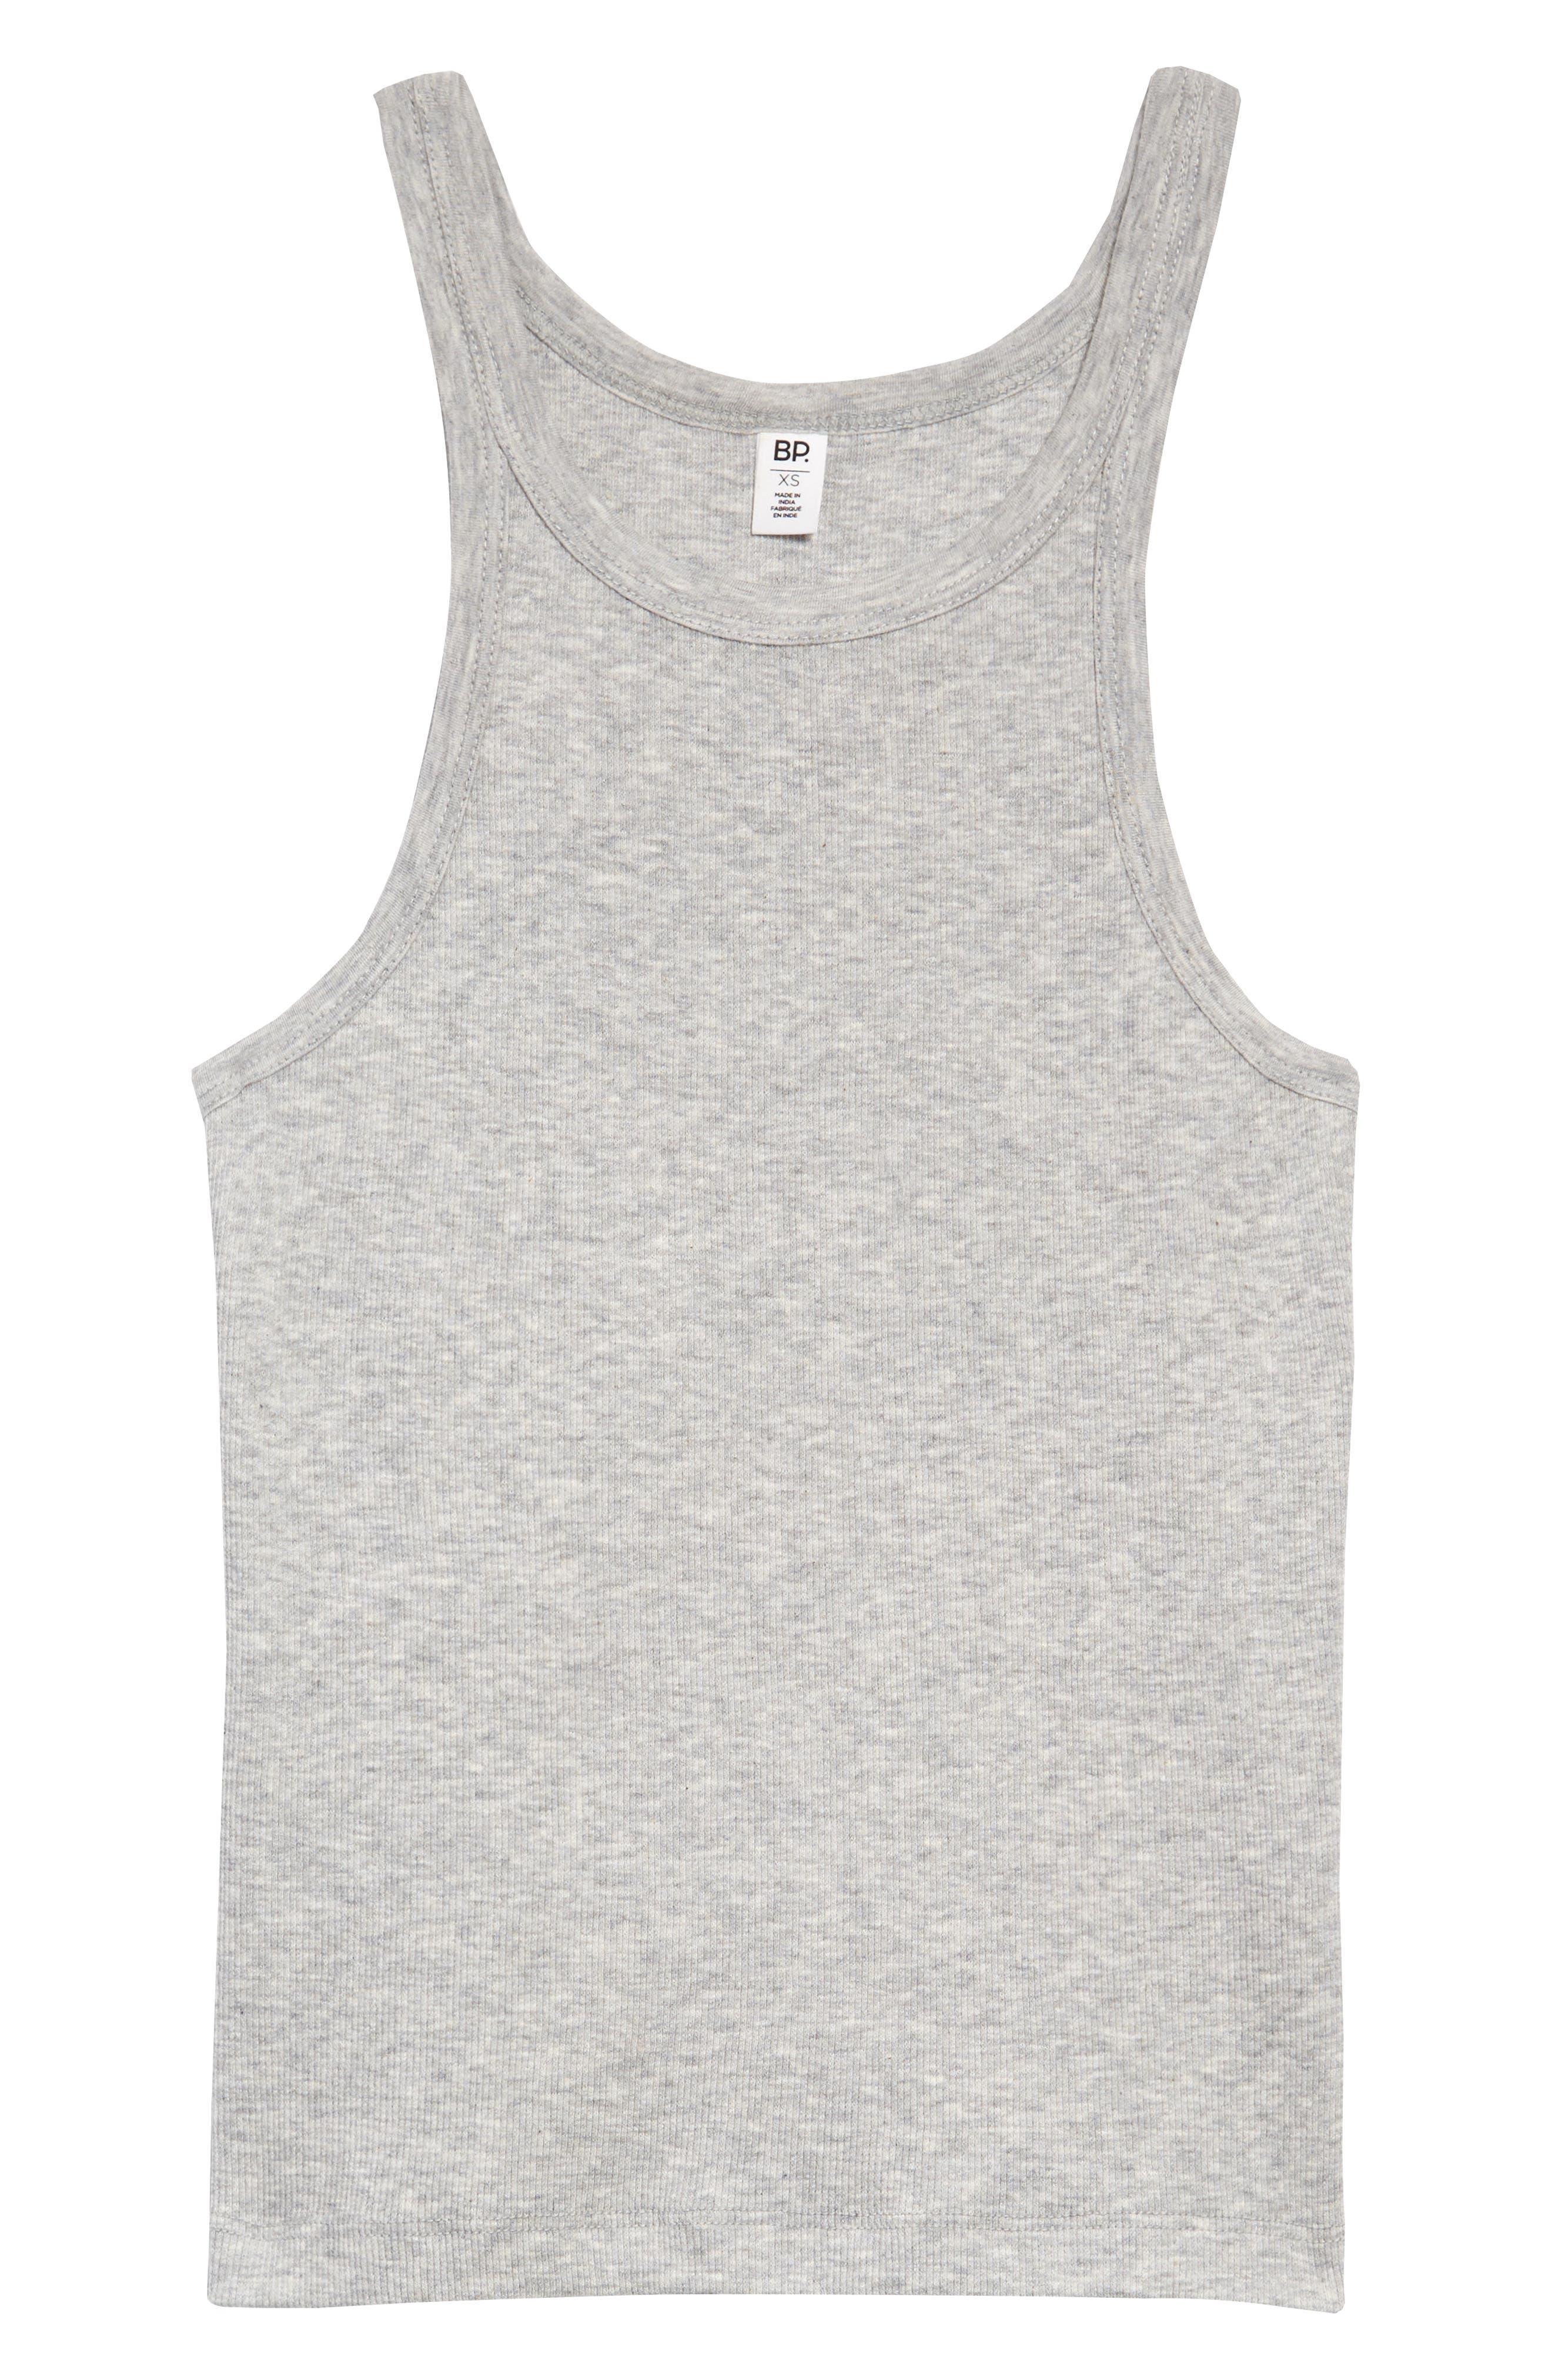 New Juniors Sleeveless Tank Lace Back Cami Top